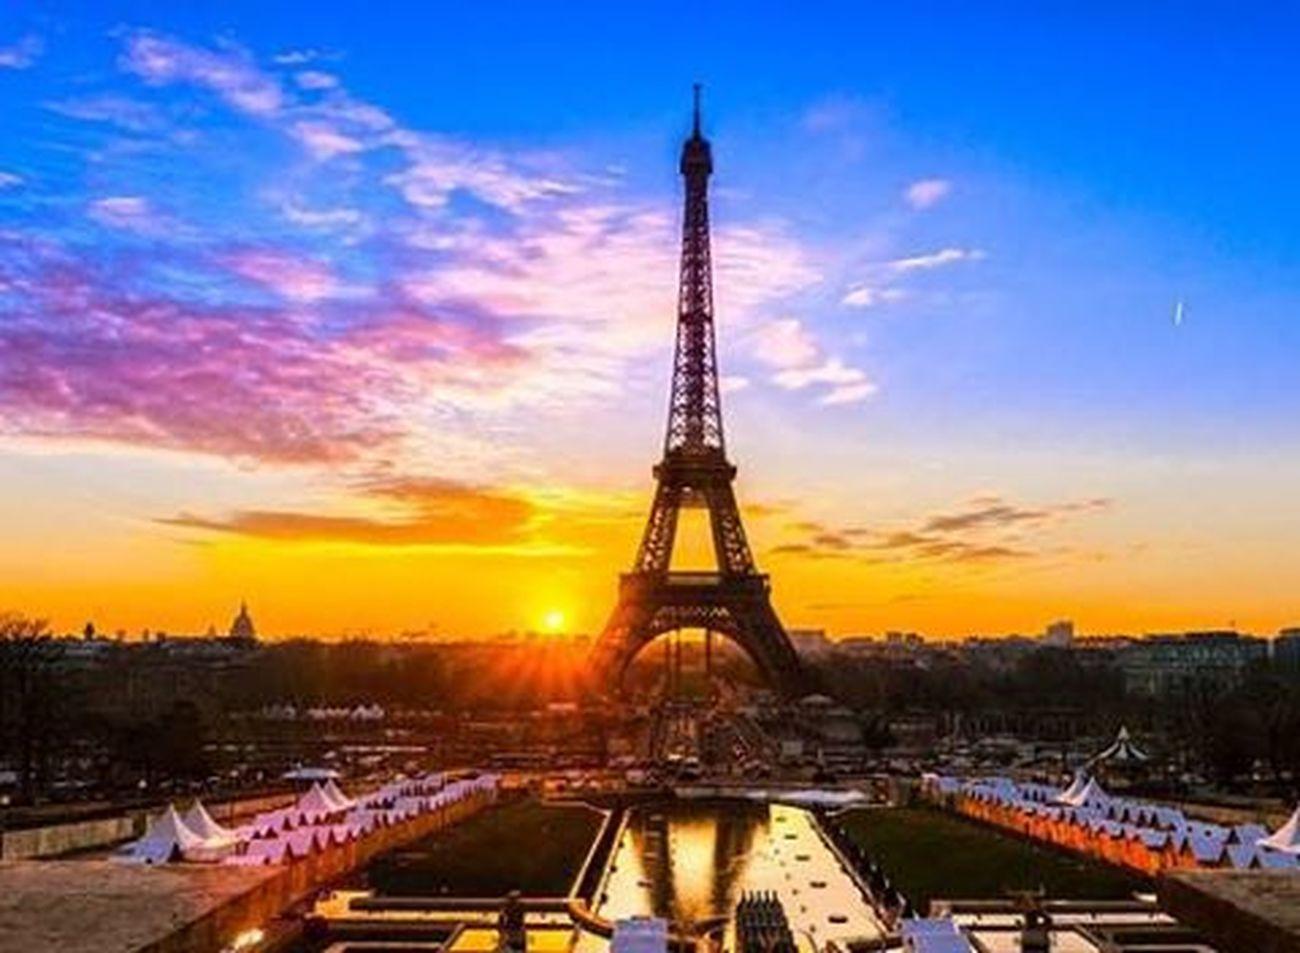 france nos cœurs avec vous. Prayforparis France Pasdeterrorisme Terörehayır Noterrorism